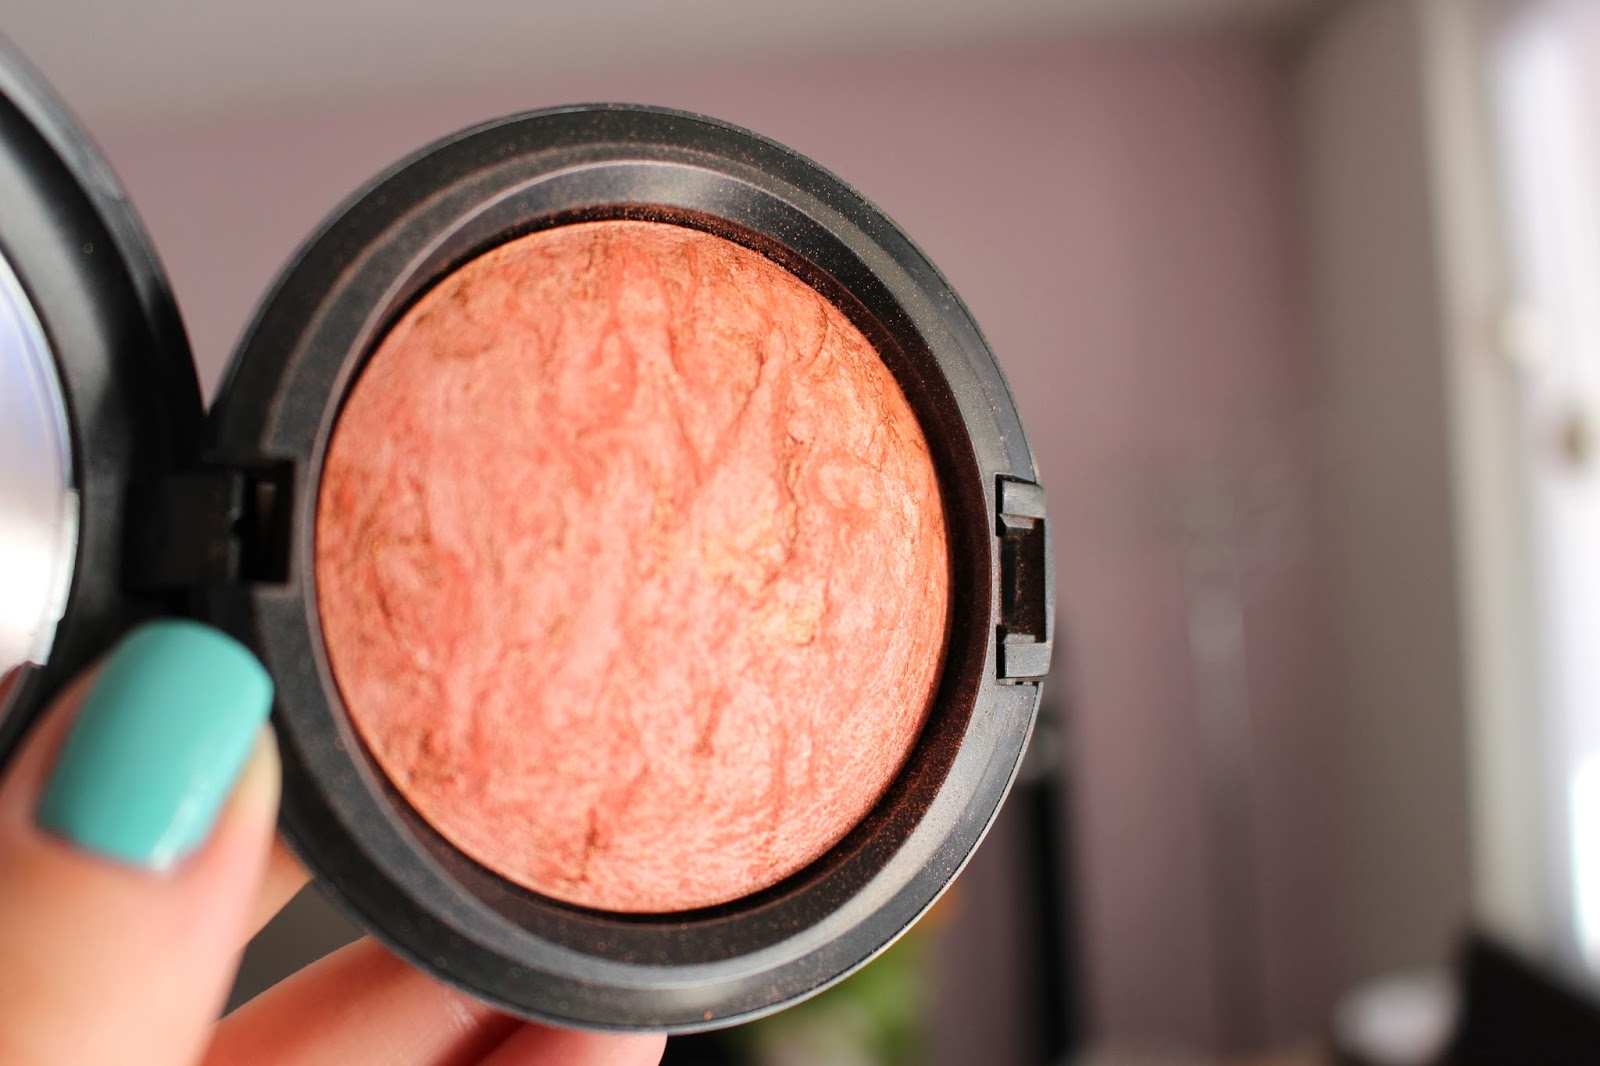 makeup-haul-mac-cosmetics-loreal-3